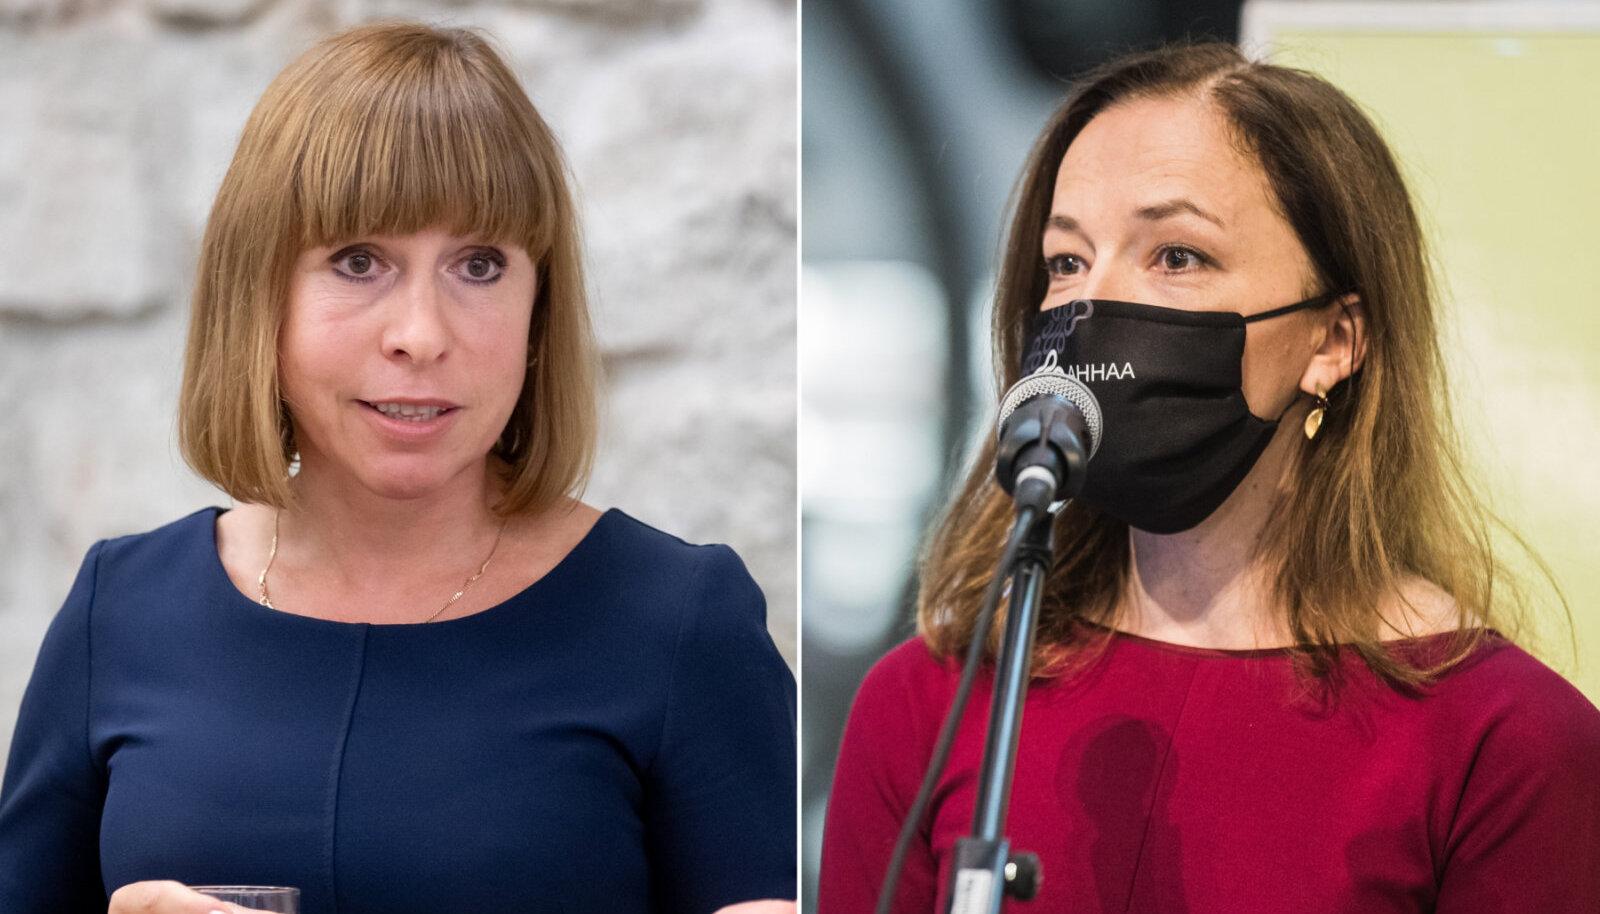 Ulla Illison ja Liina Kersna